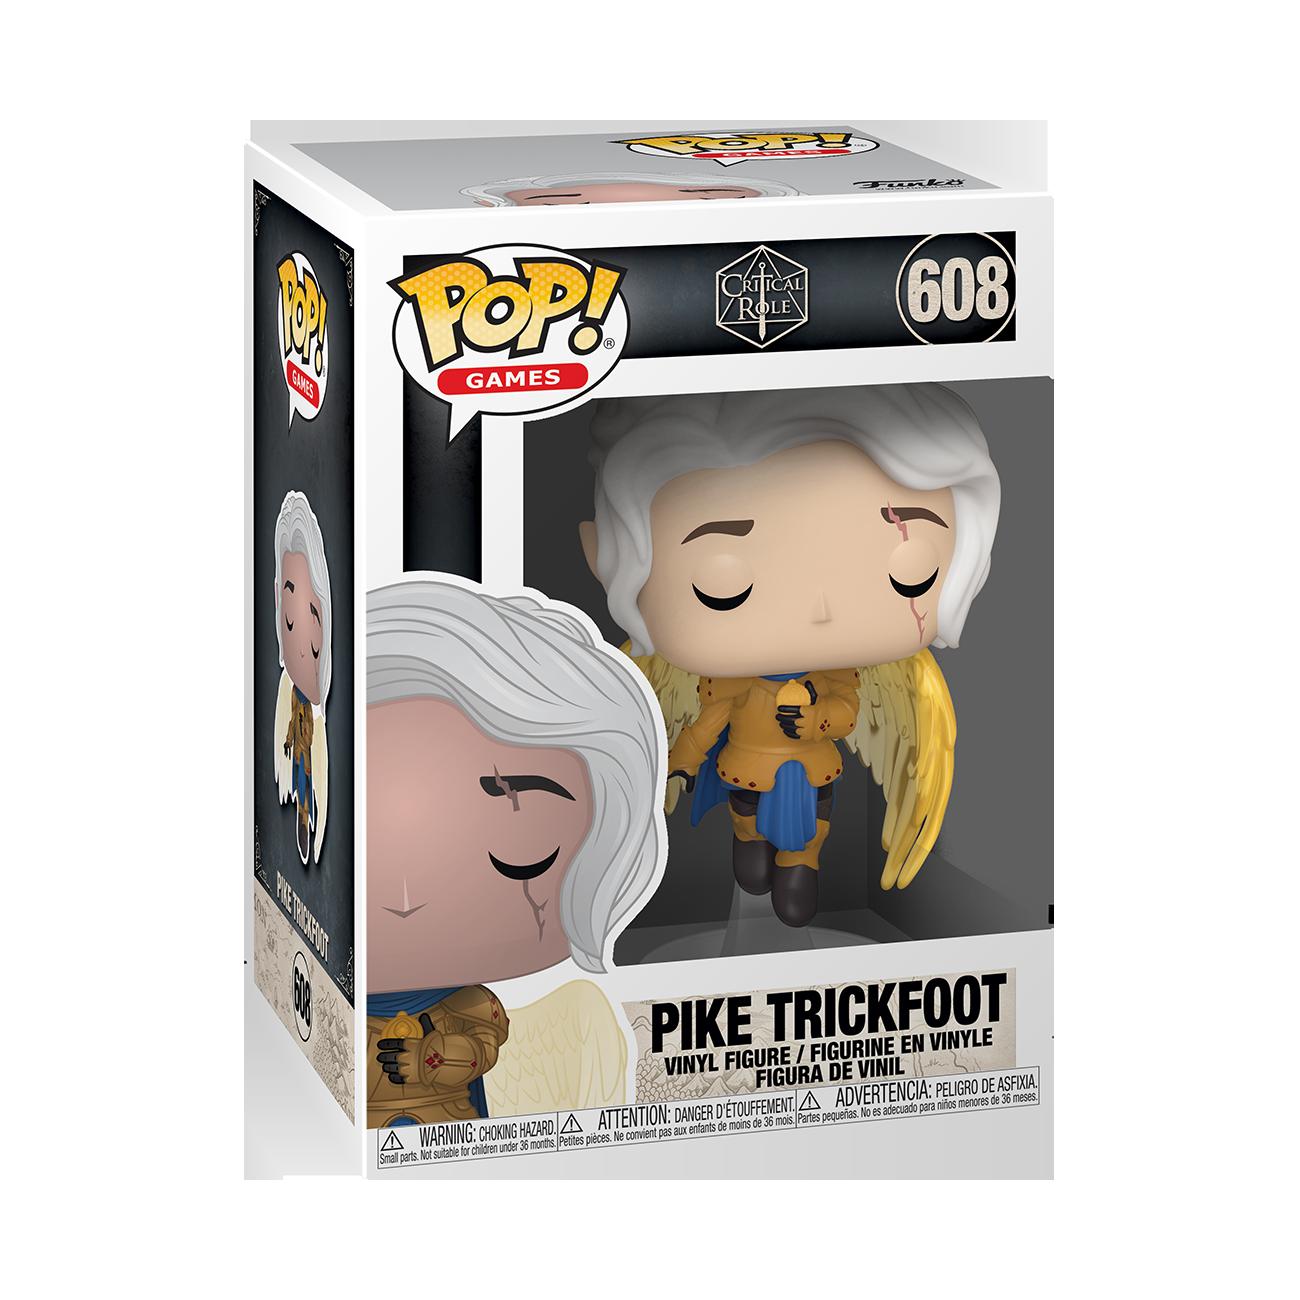 Funko POP! Games Critical Role Pike Trickfoot #608